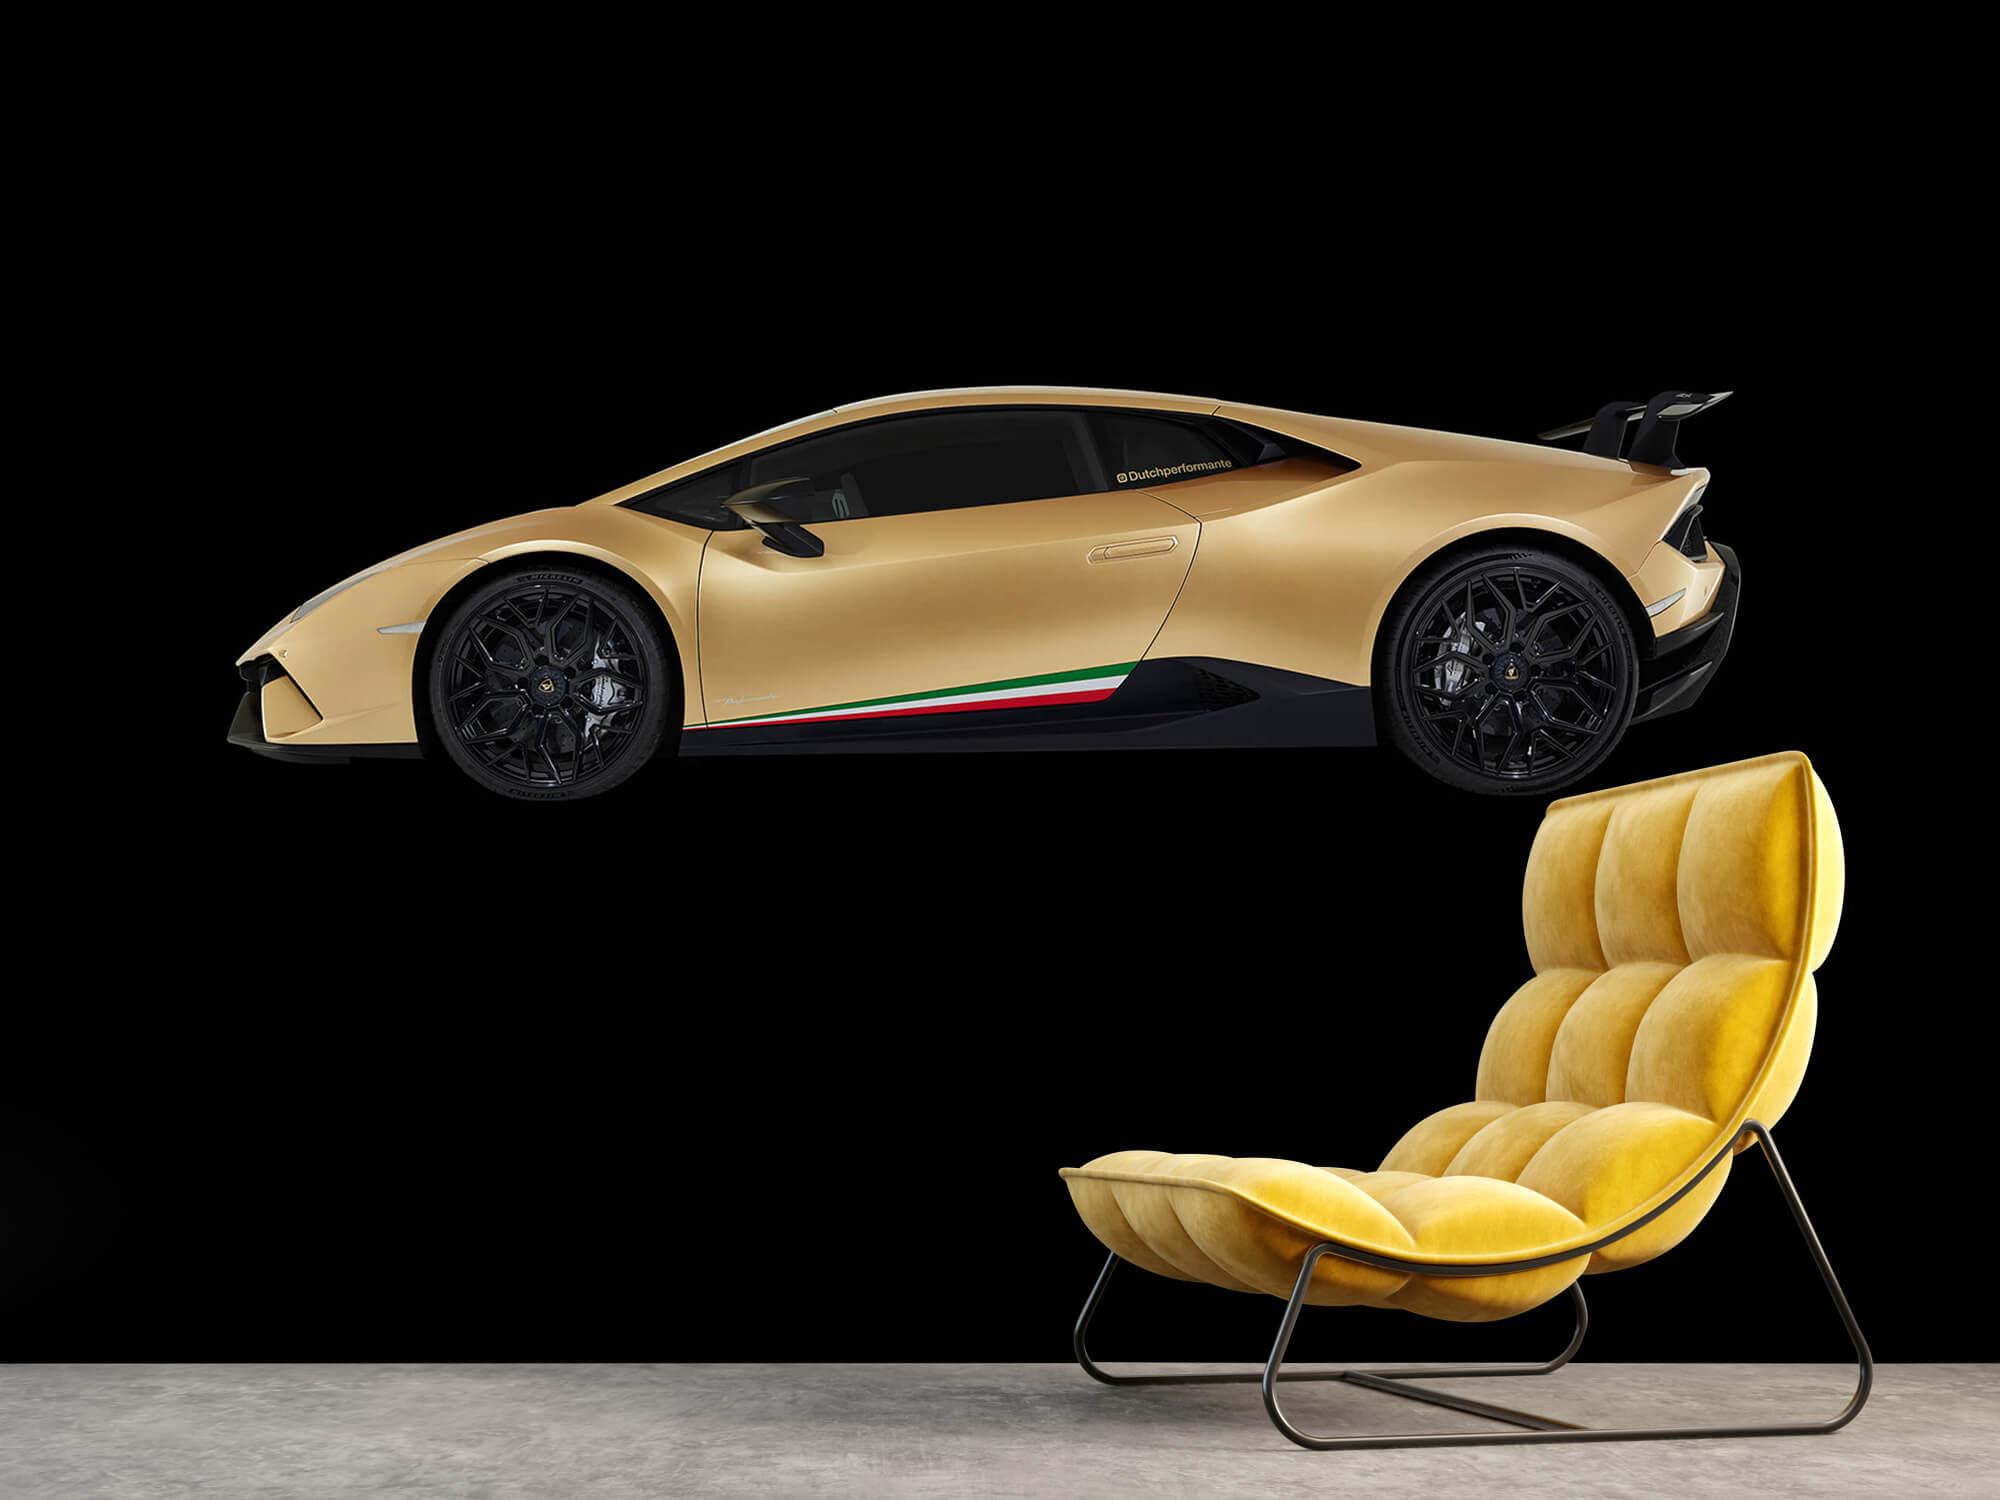 Wallpaper Lamborghini Huracán - Zijkant, zwart 3